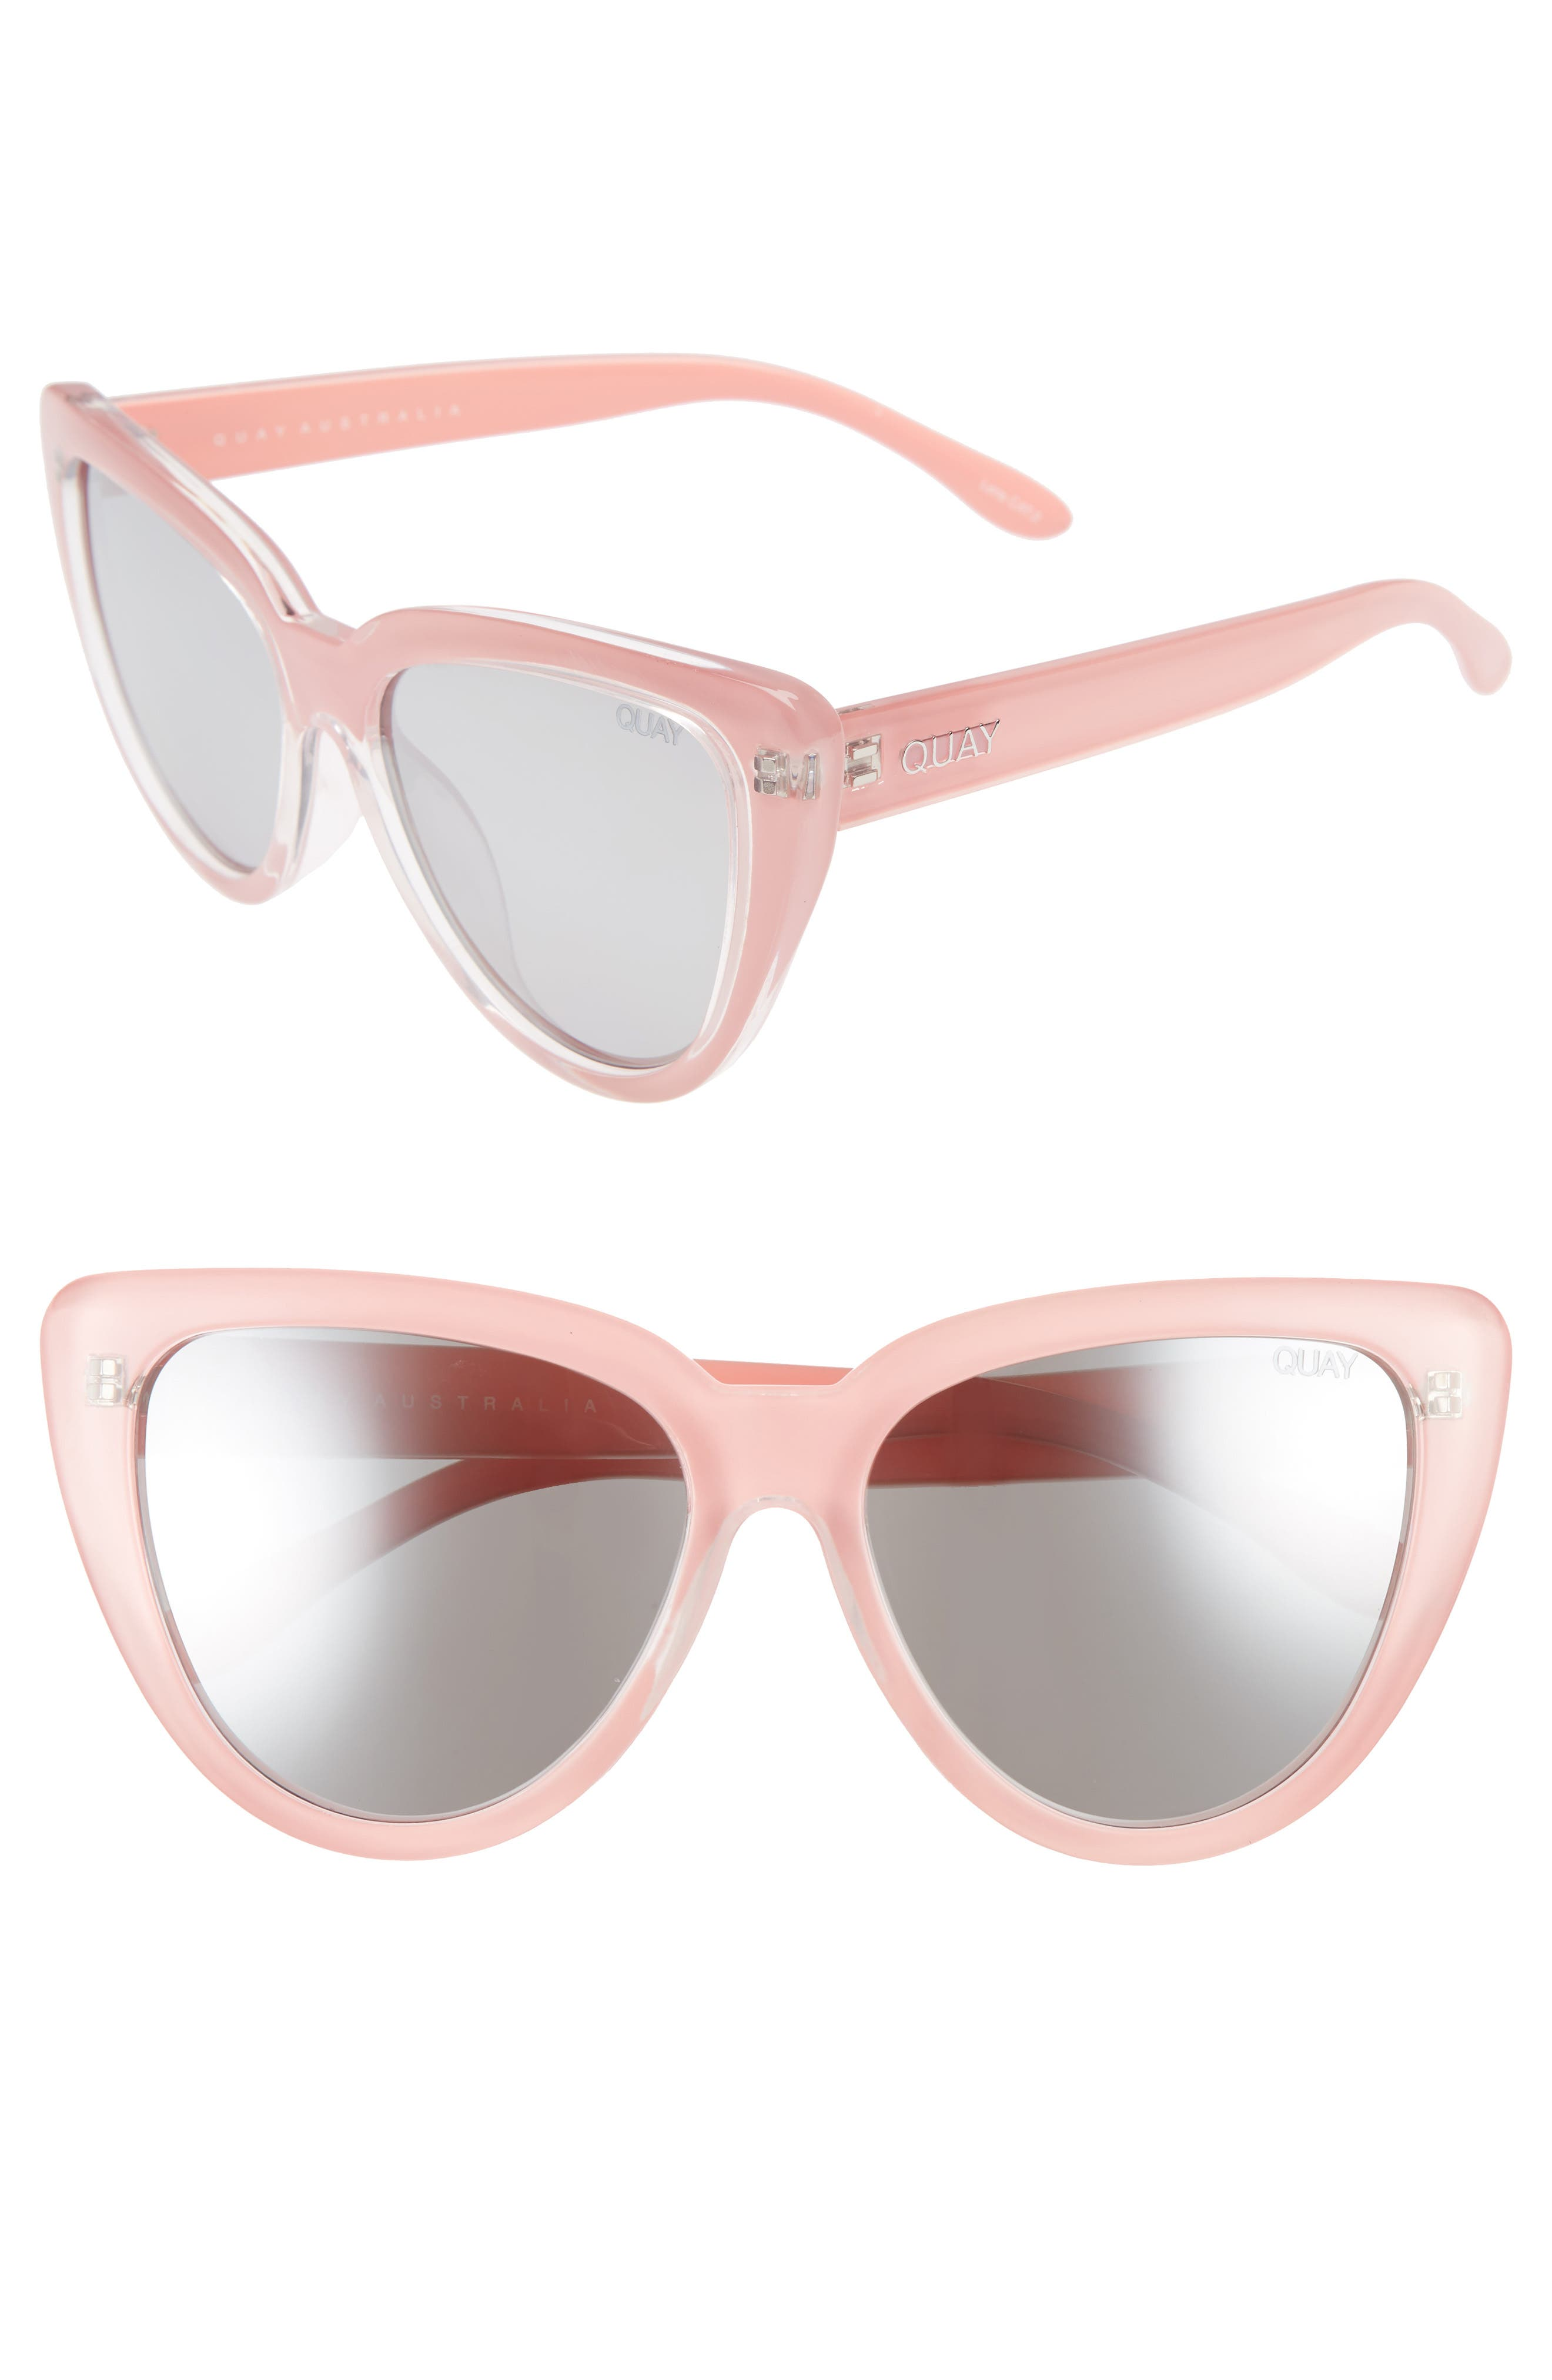 4c1a6d7bc6f79 Quay Australia Stray Cat 5m Mirrored Cat Eye Sunglasses - Peach  Gradual  Flash Mirror